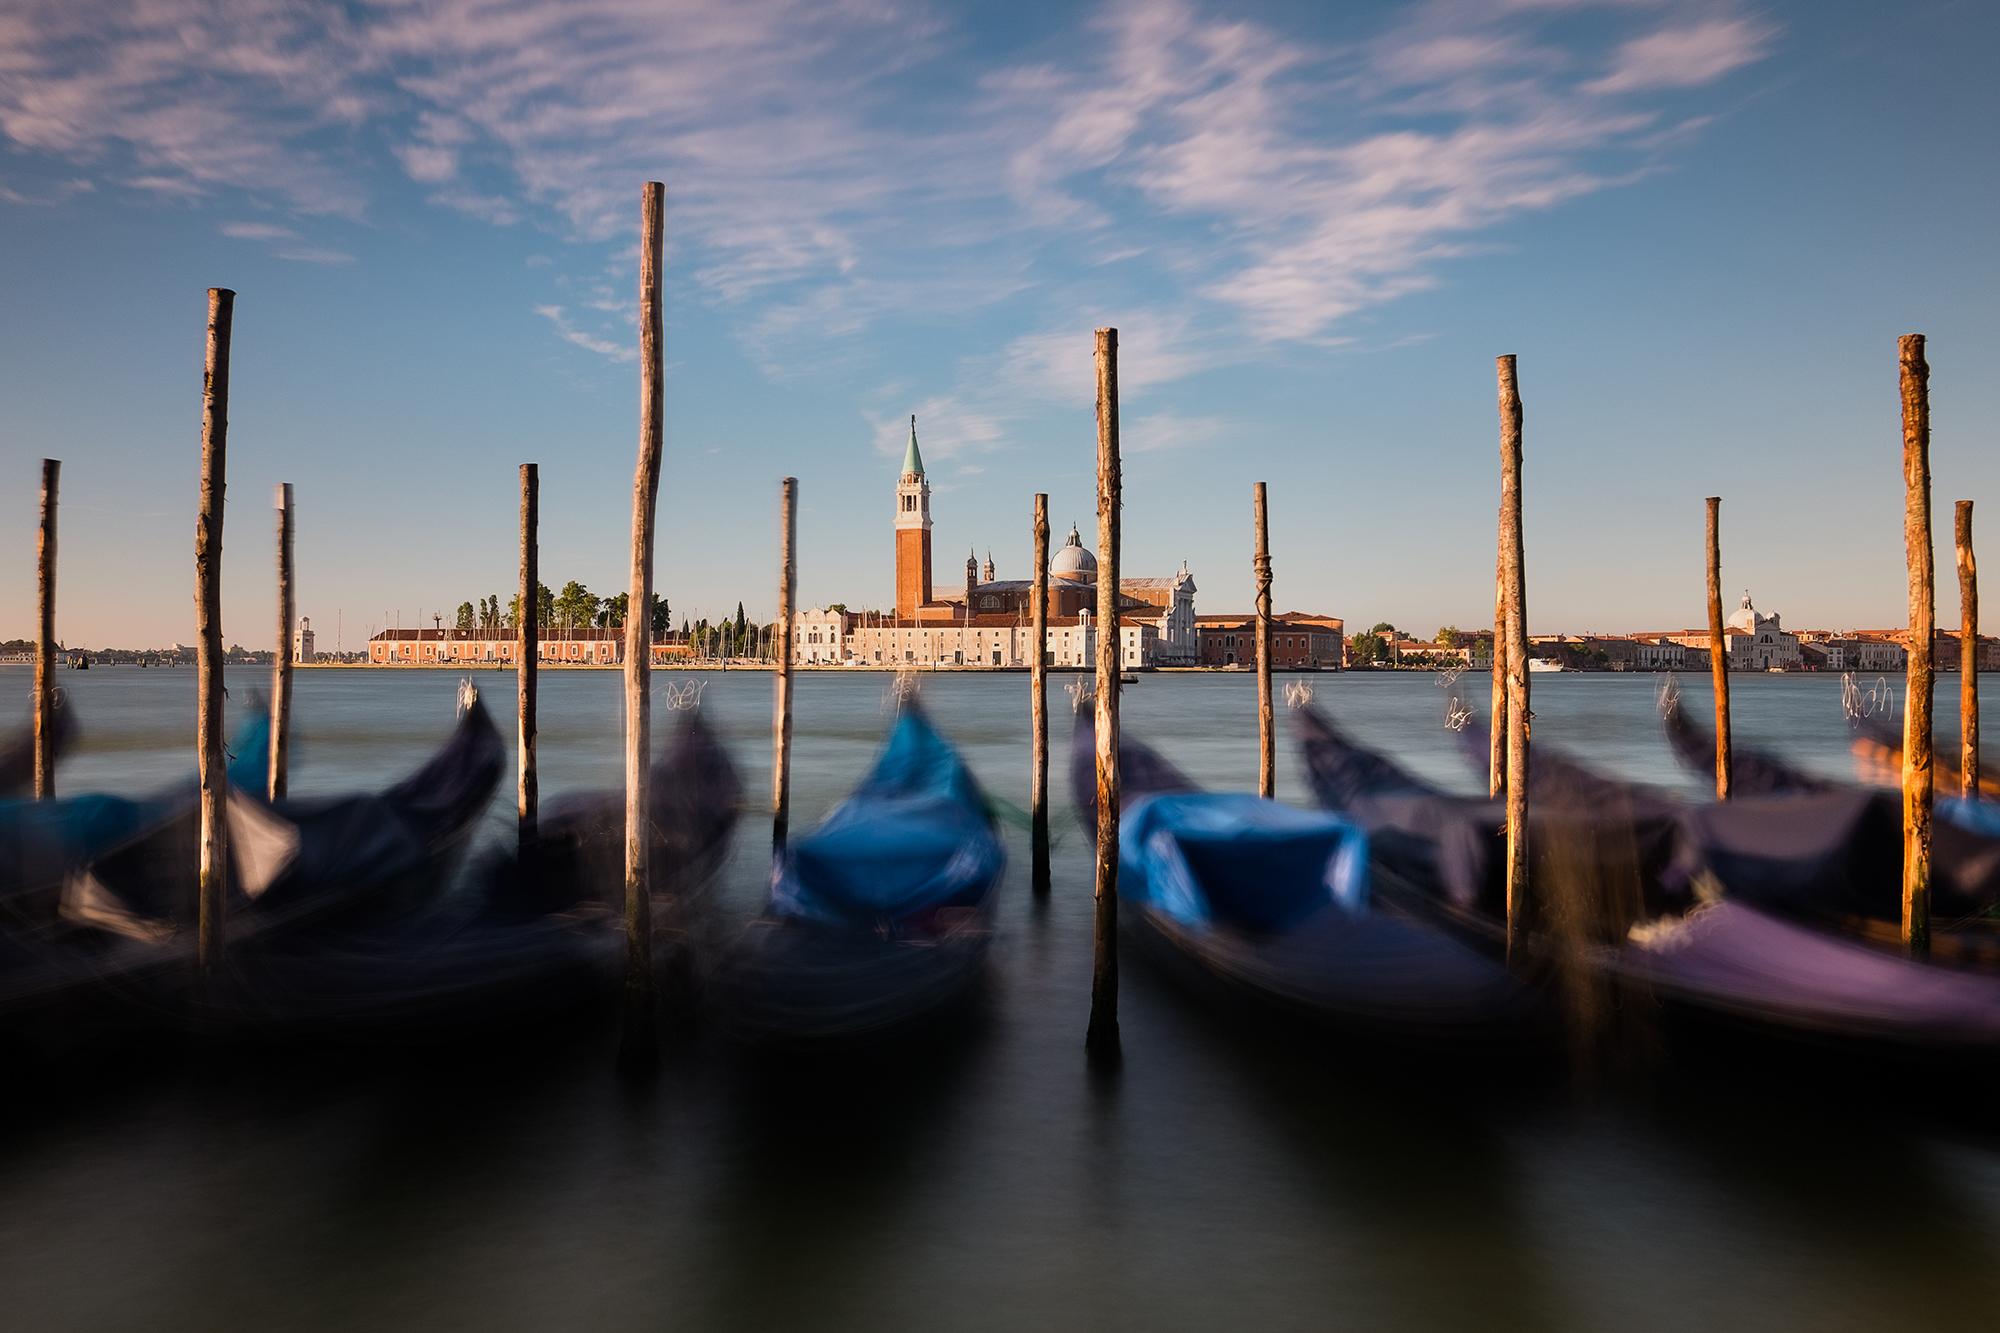 Gondolas in the Morning, Venice